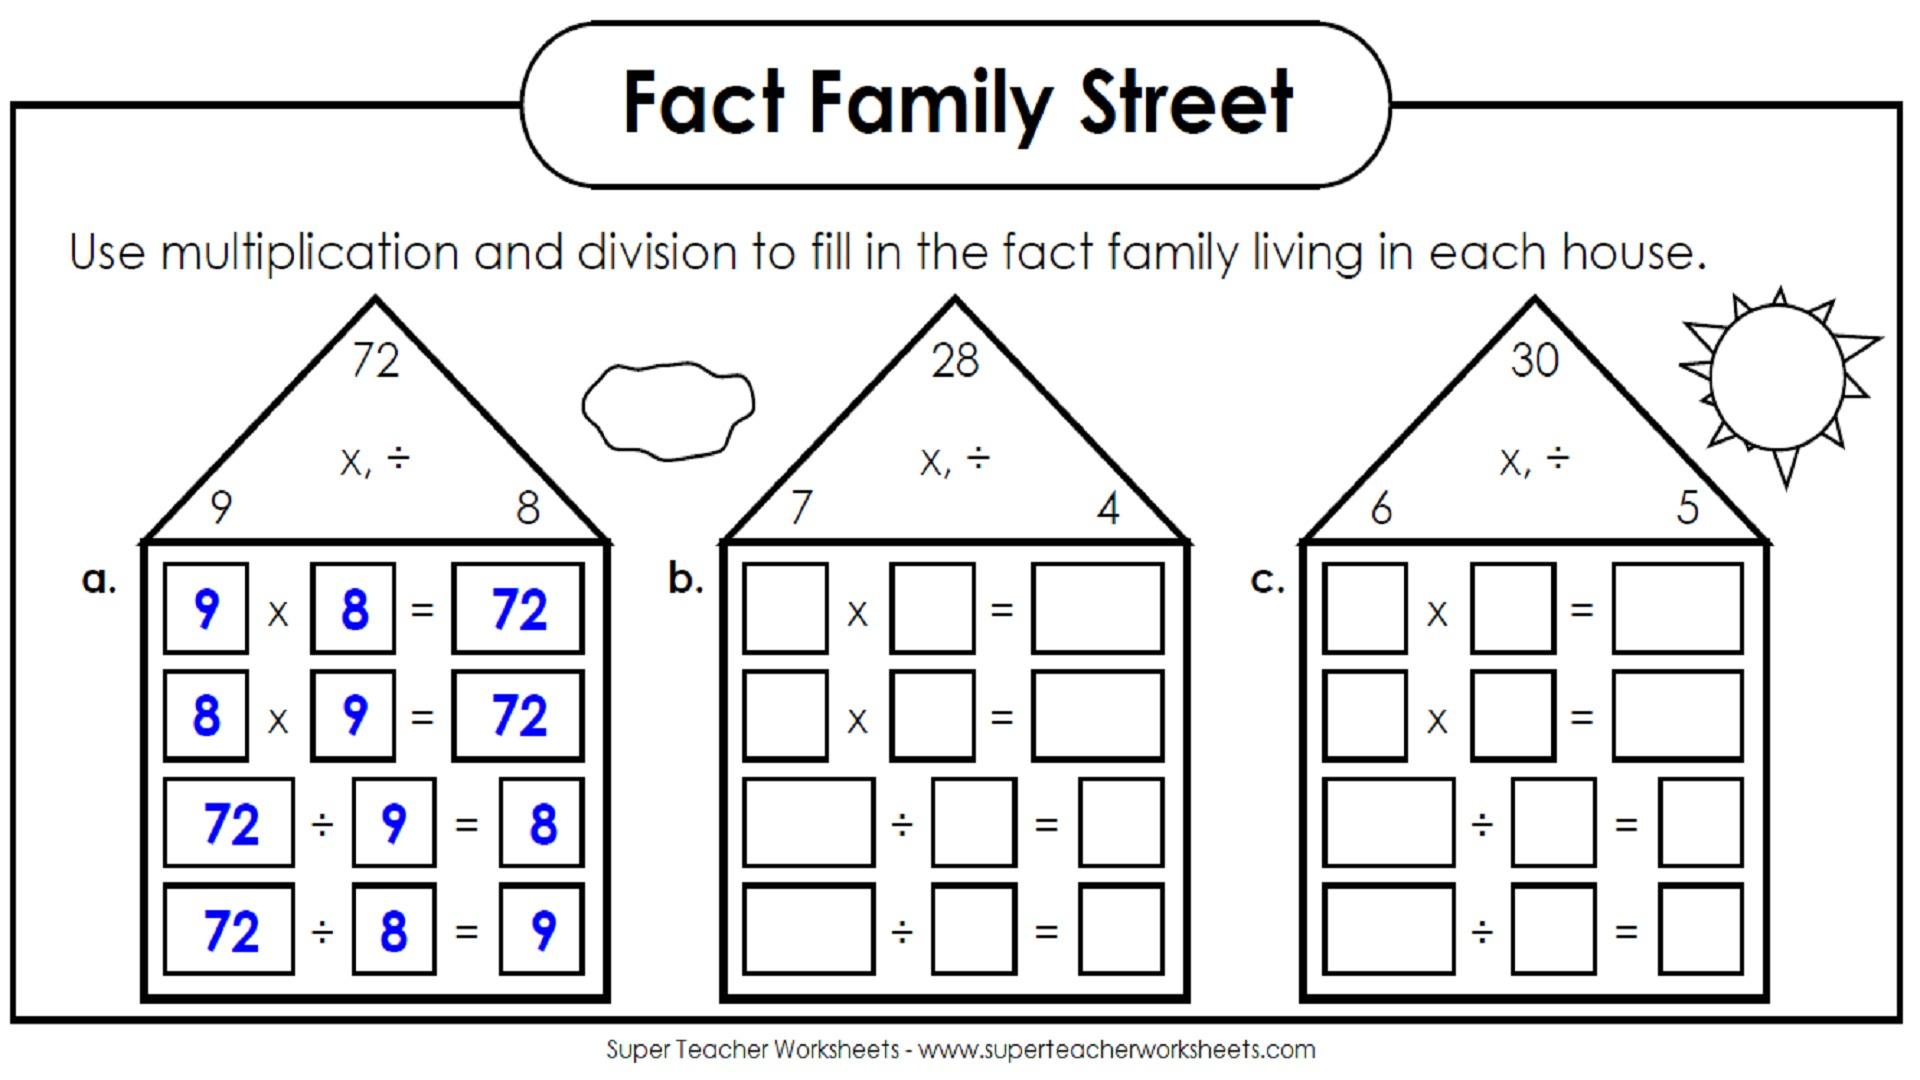 Splashtop Whiteboard Background Graphics | Free Printable Multiplication Division Fact Family Worksheets